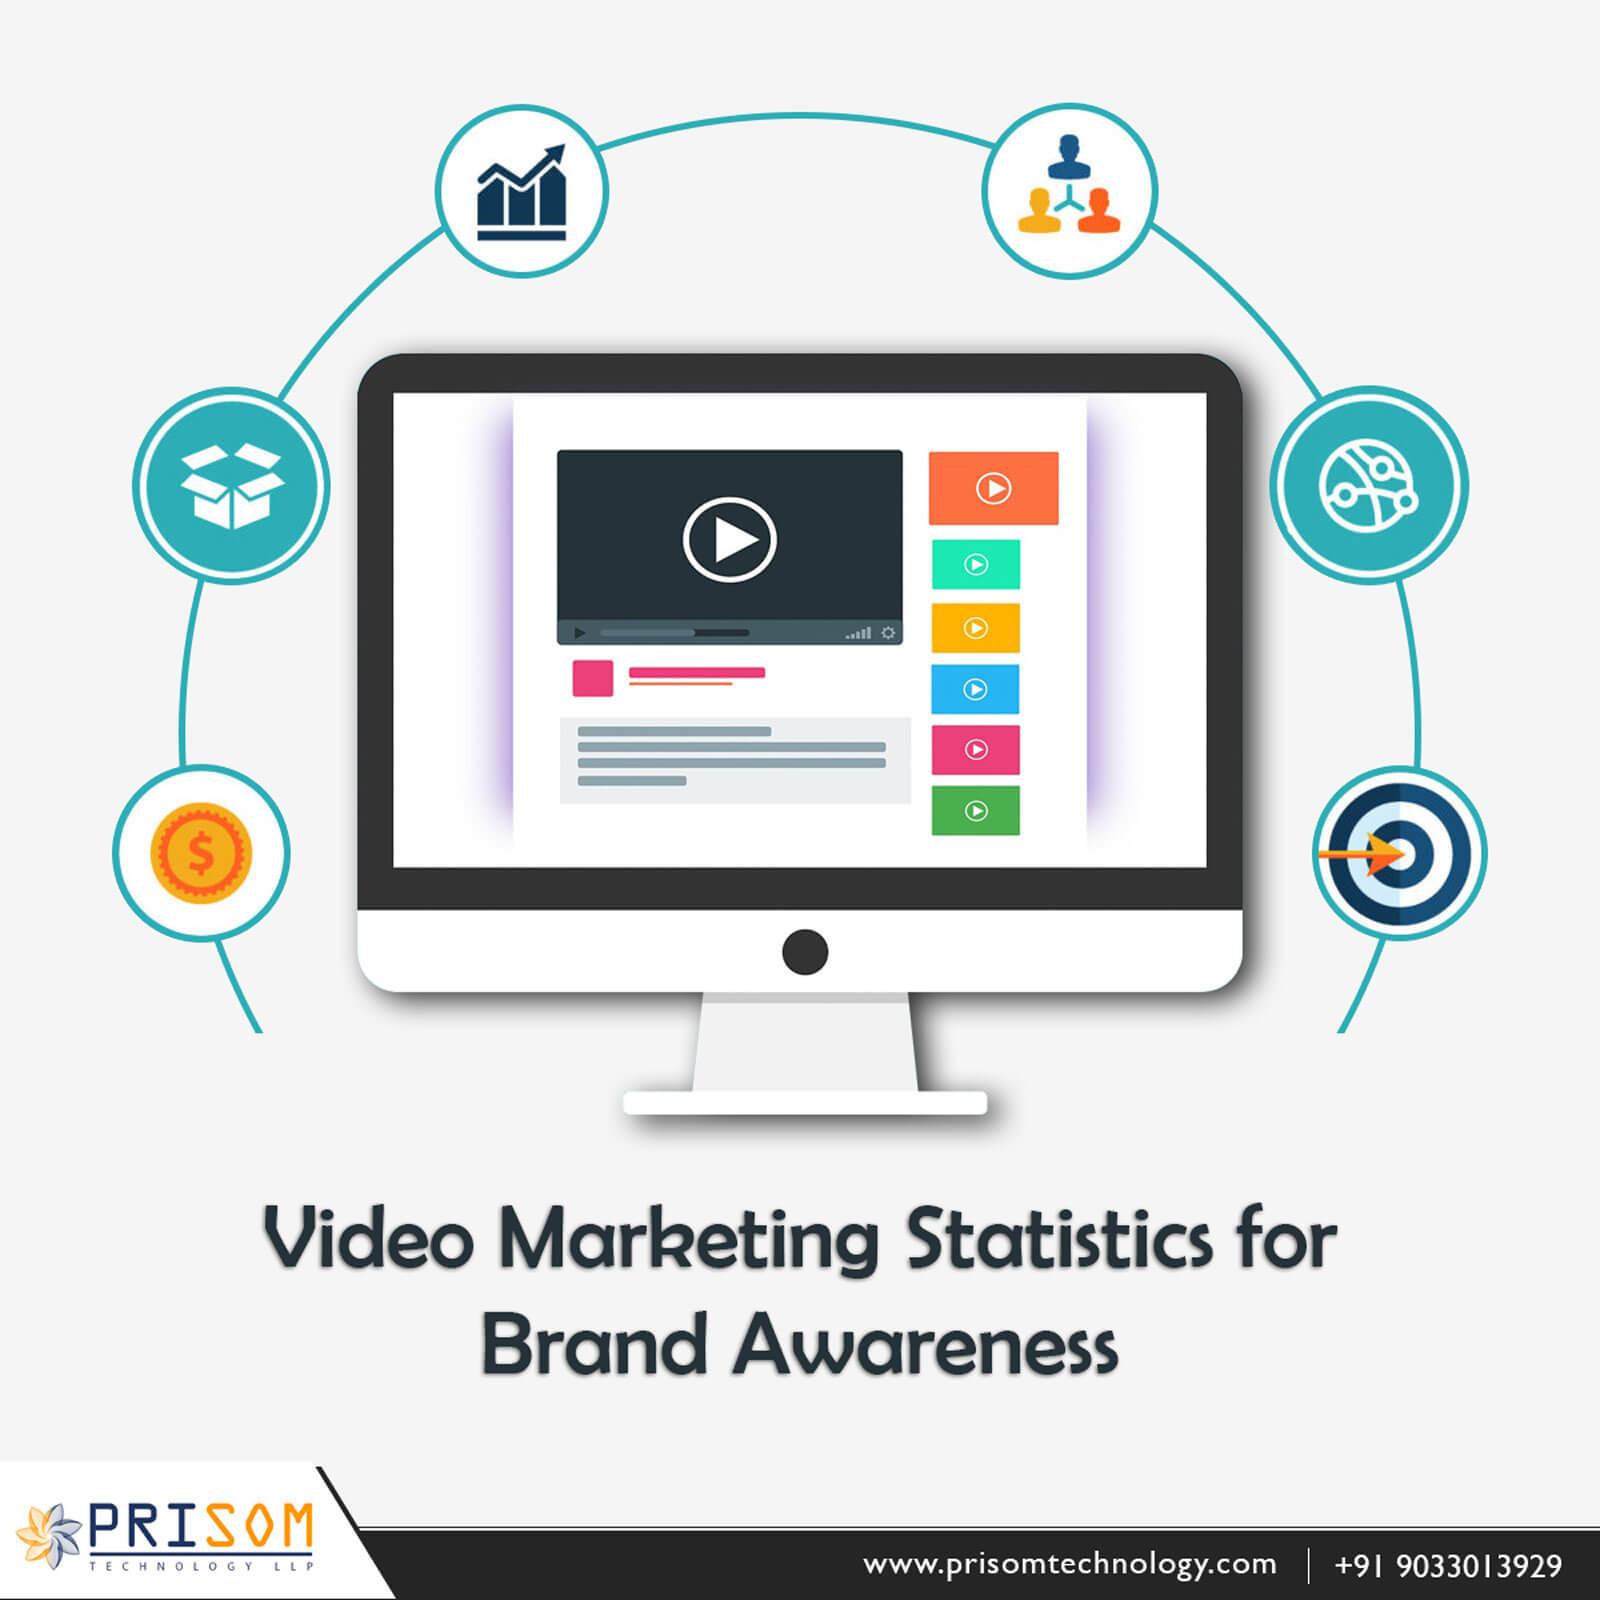 Video-Marketing-Statistics-for-Brand-Awareness